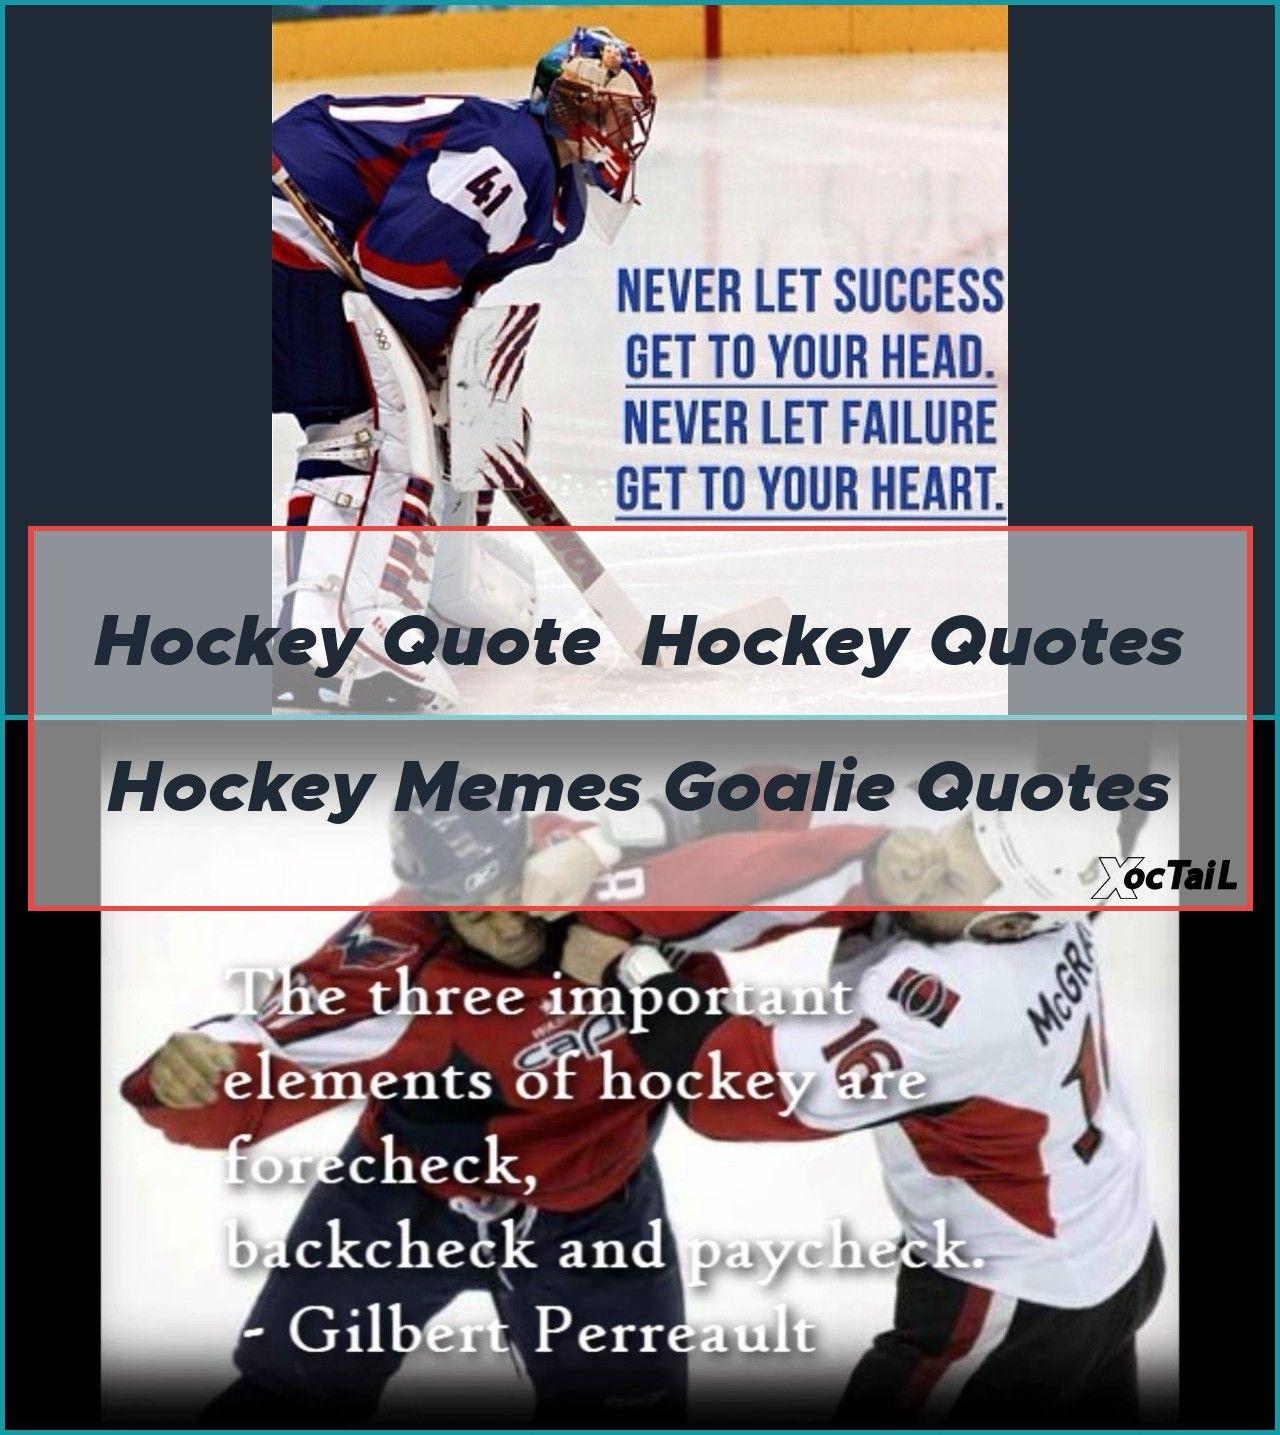 Hockey Quote Hockey Quotes Hockey Memes Goalie Quotes Hockey Quotes Famous V 2020 G